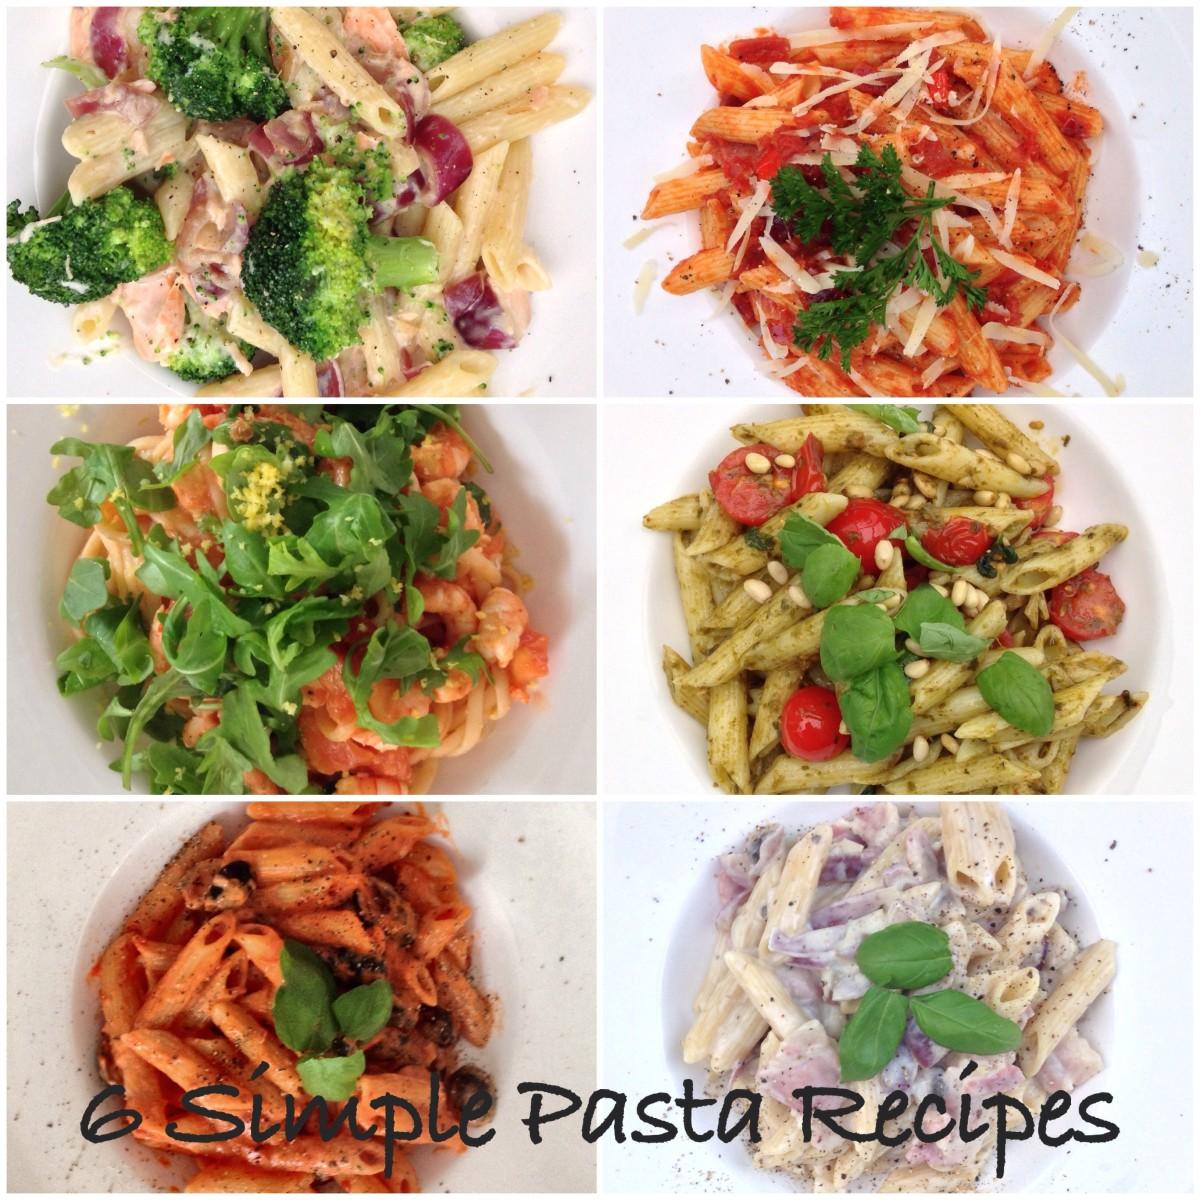 6 Quick and Easy Pasta Recipes